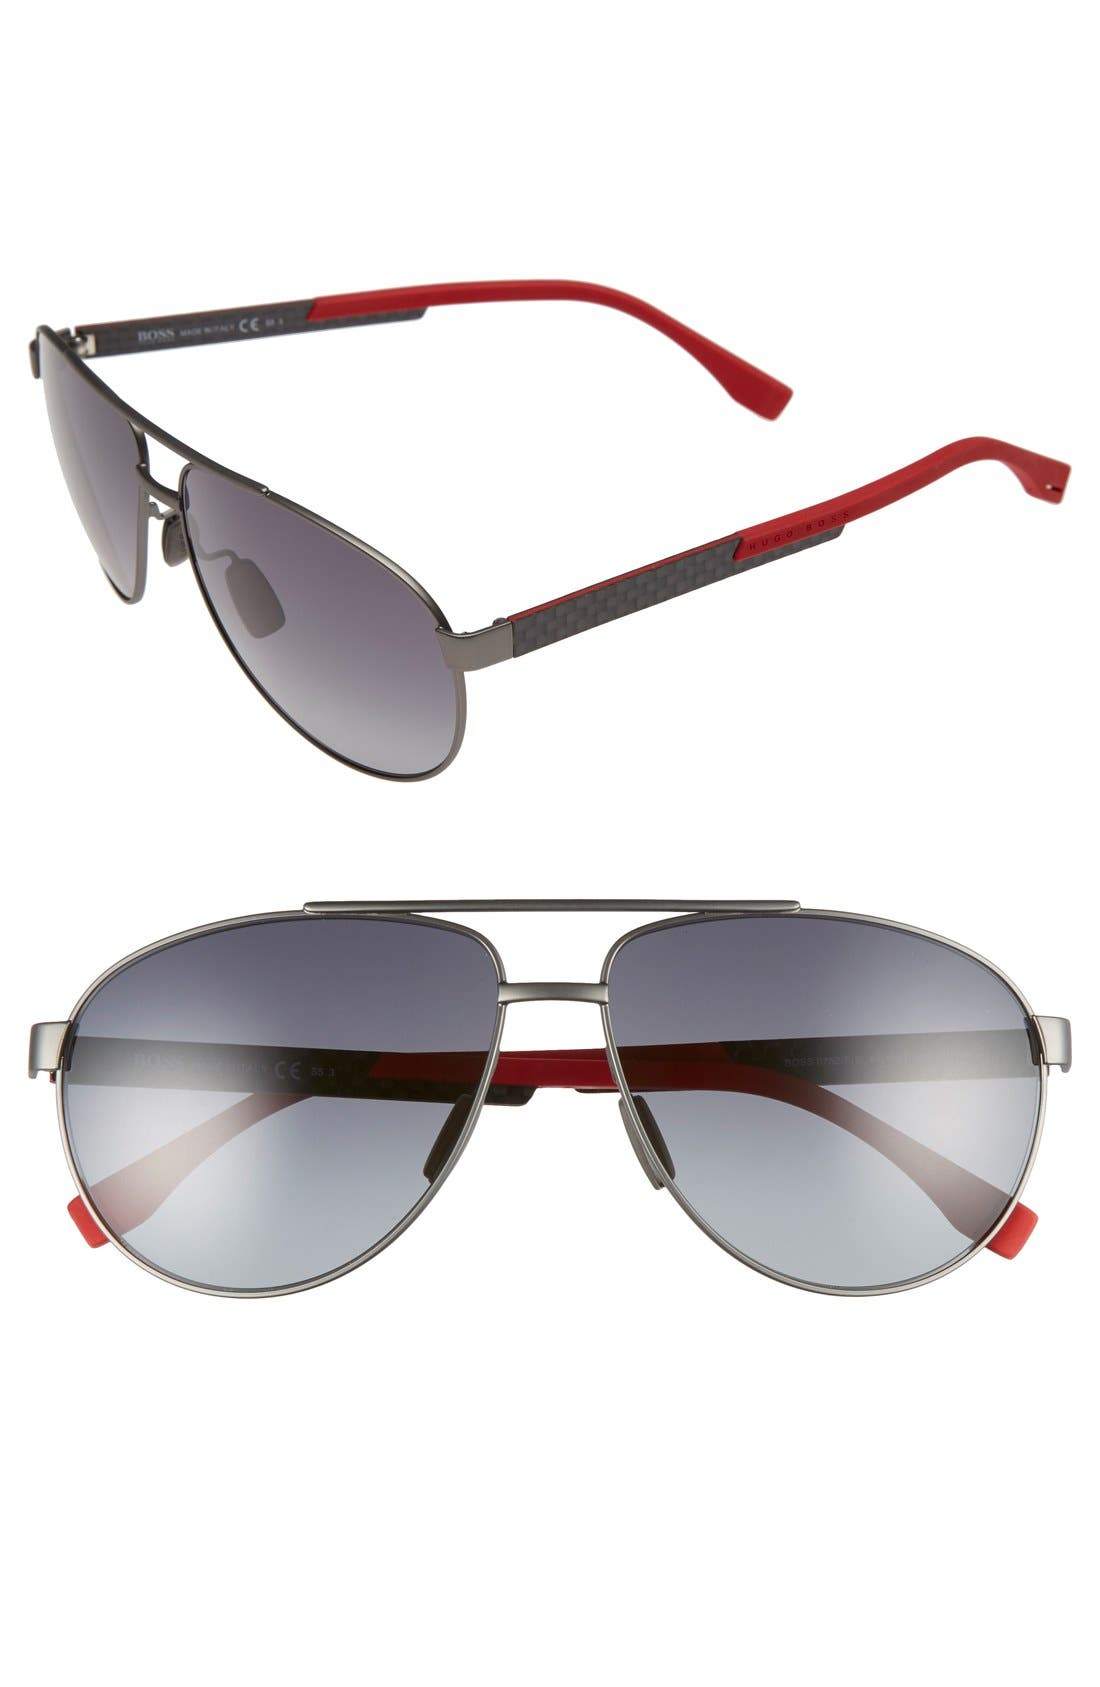 63mm Aviator Sunglasses,                         Main,                         color, 043